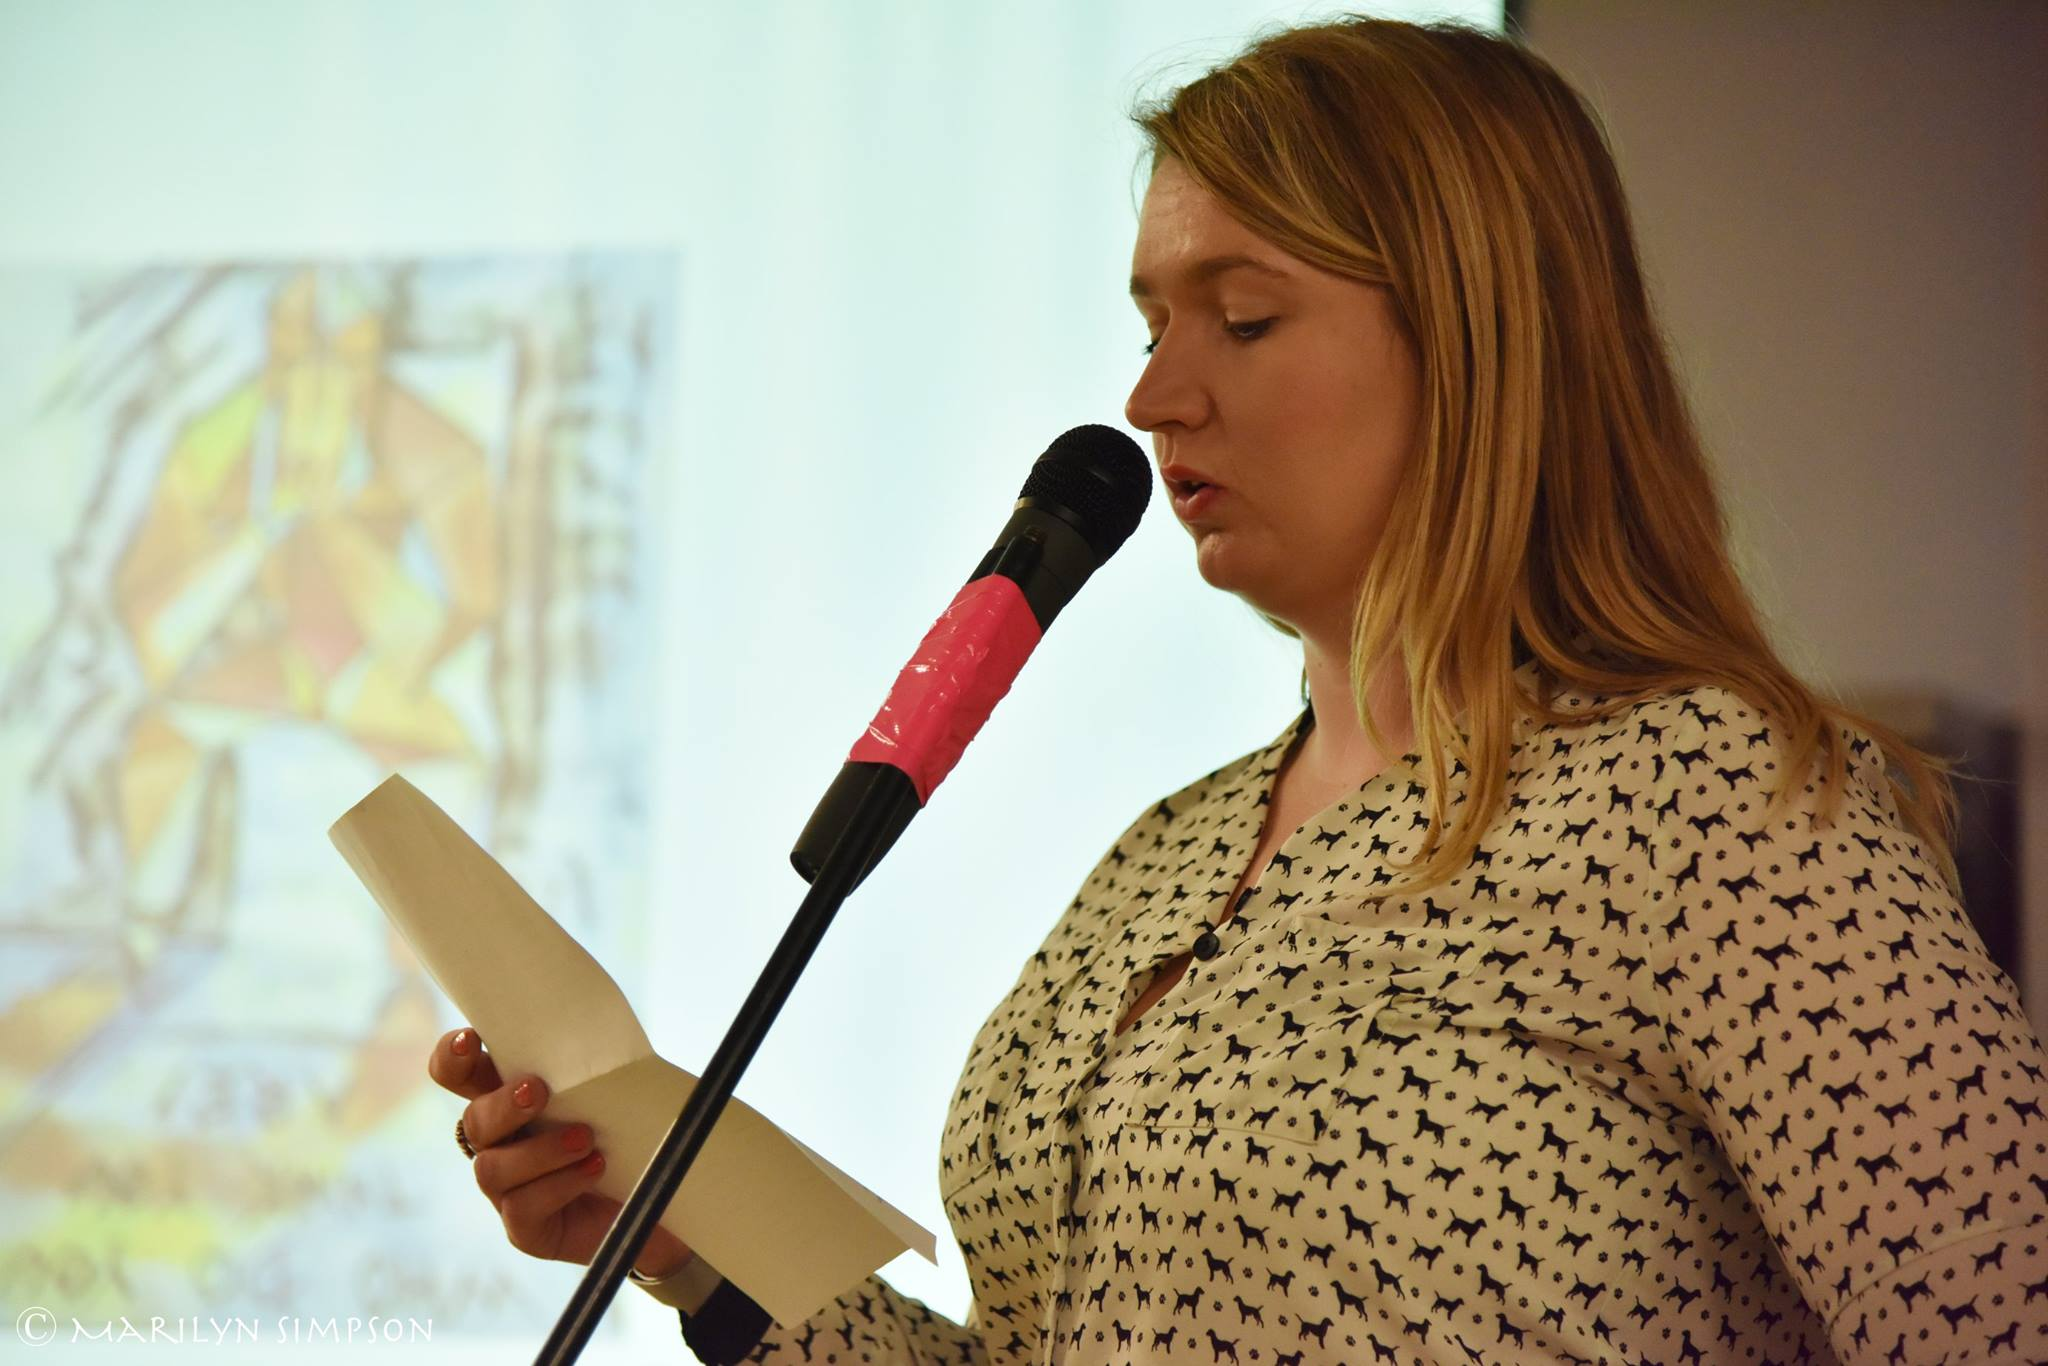 Hayley Wishart reads